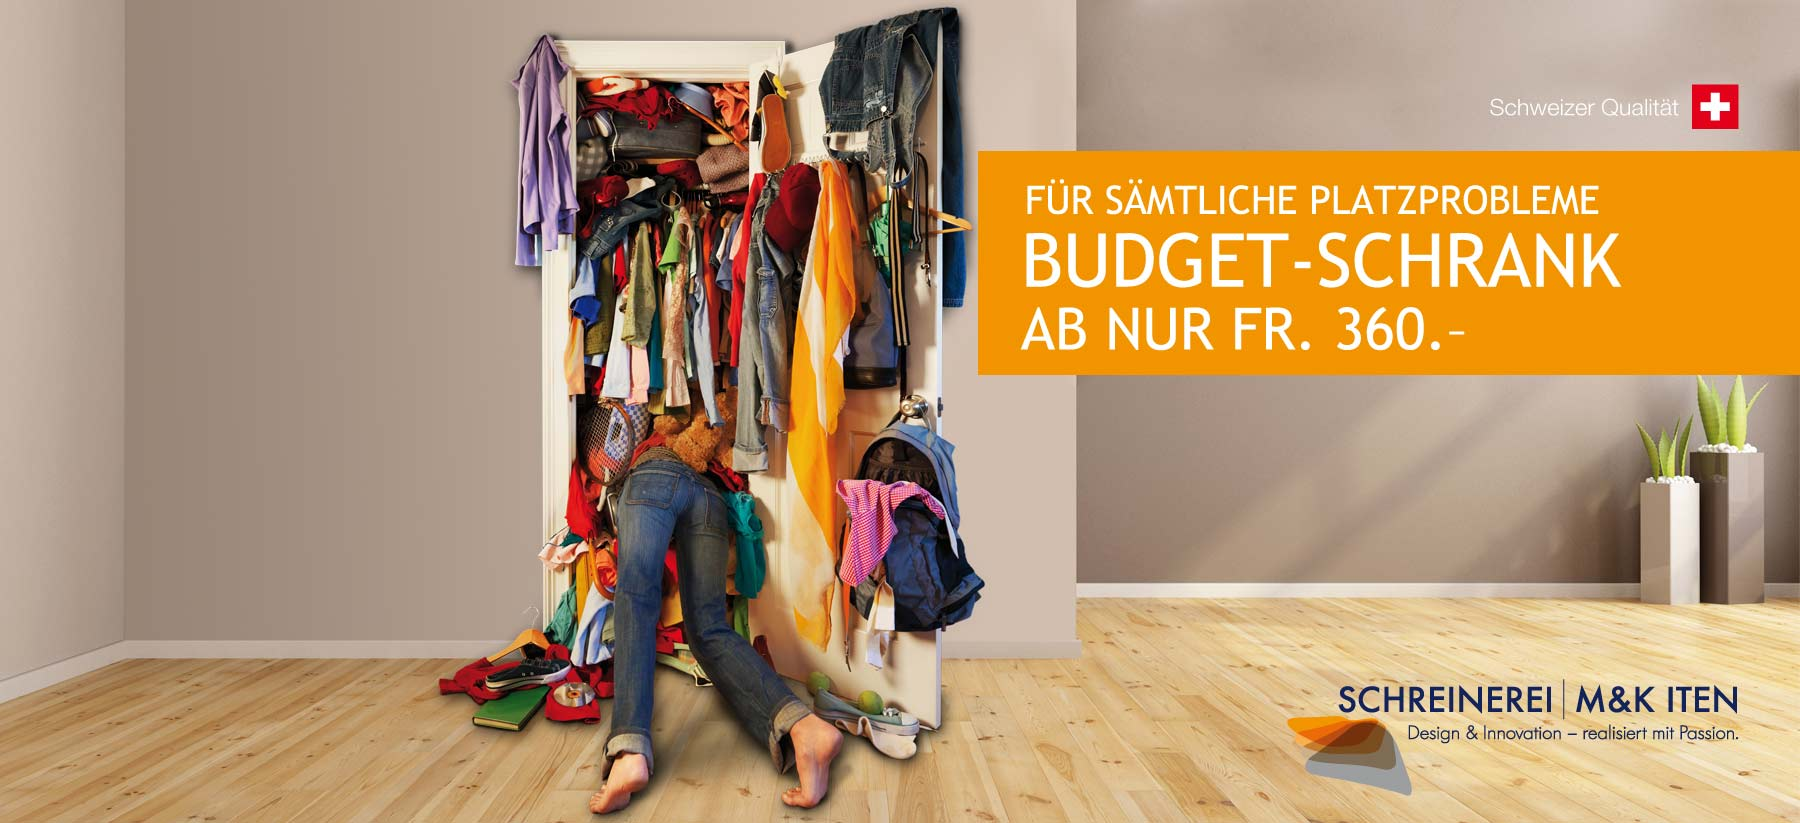 Budget cabinet